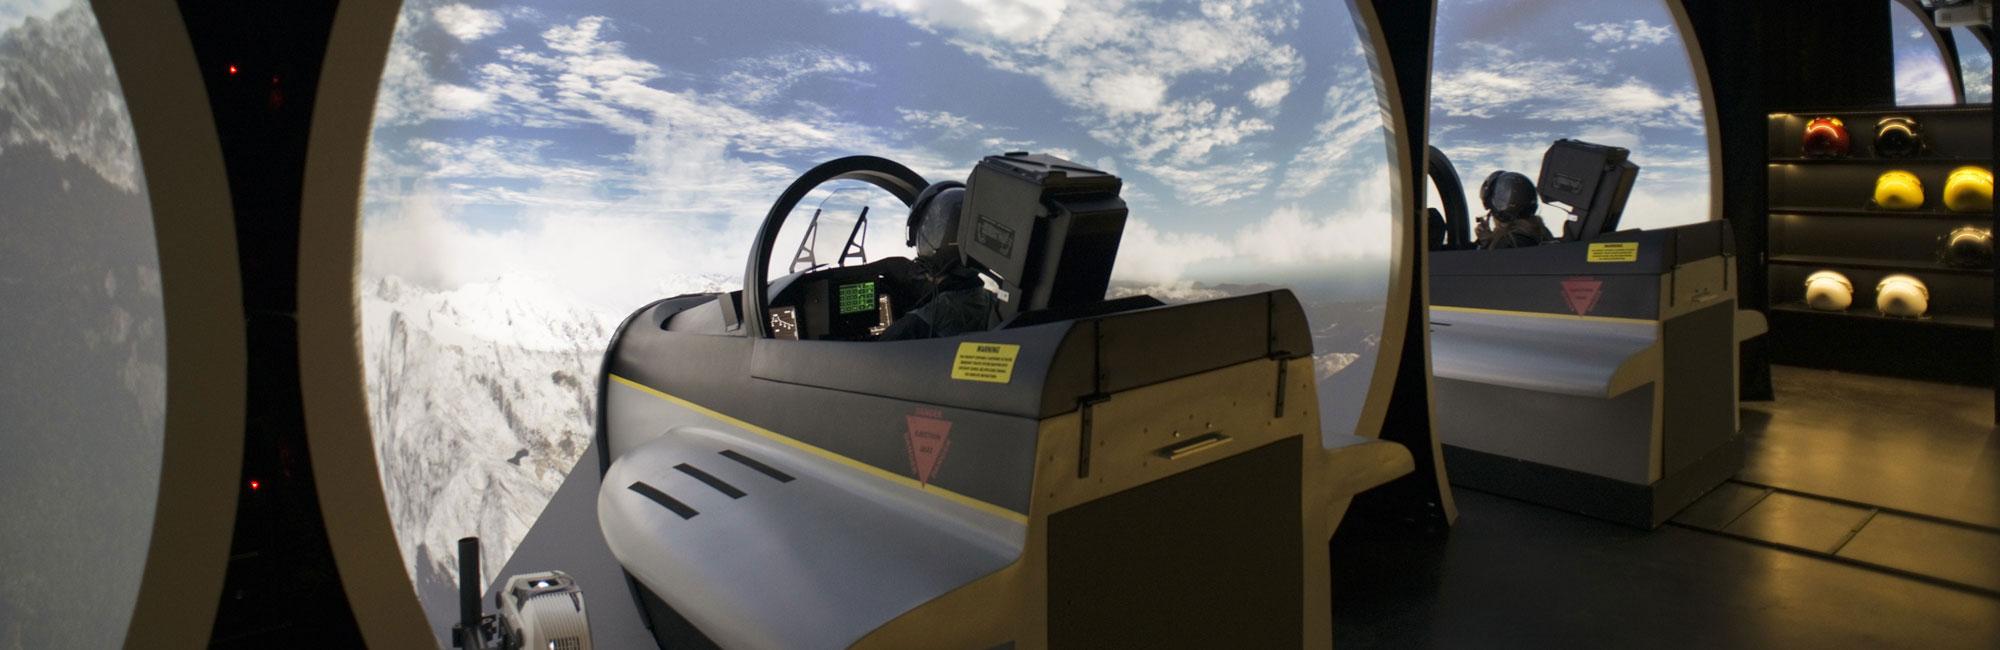 Simulation Avion de Chasse I-WAY